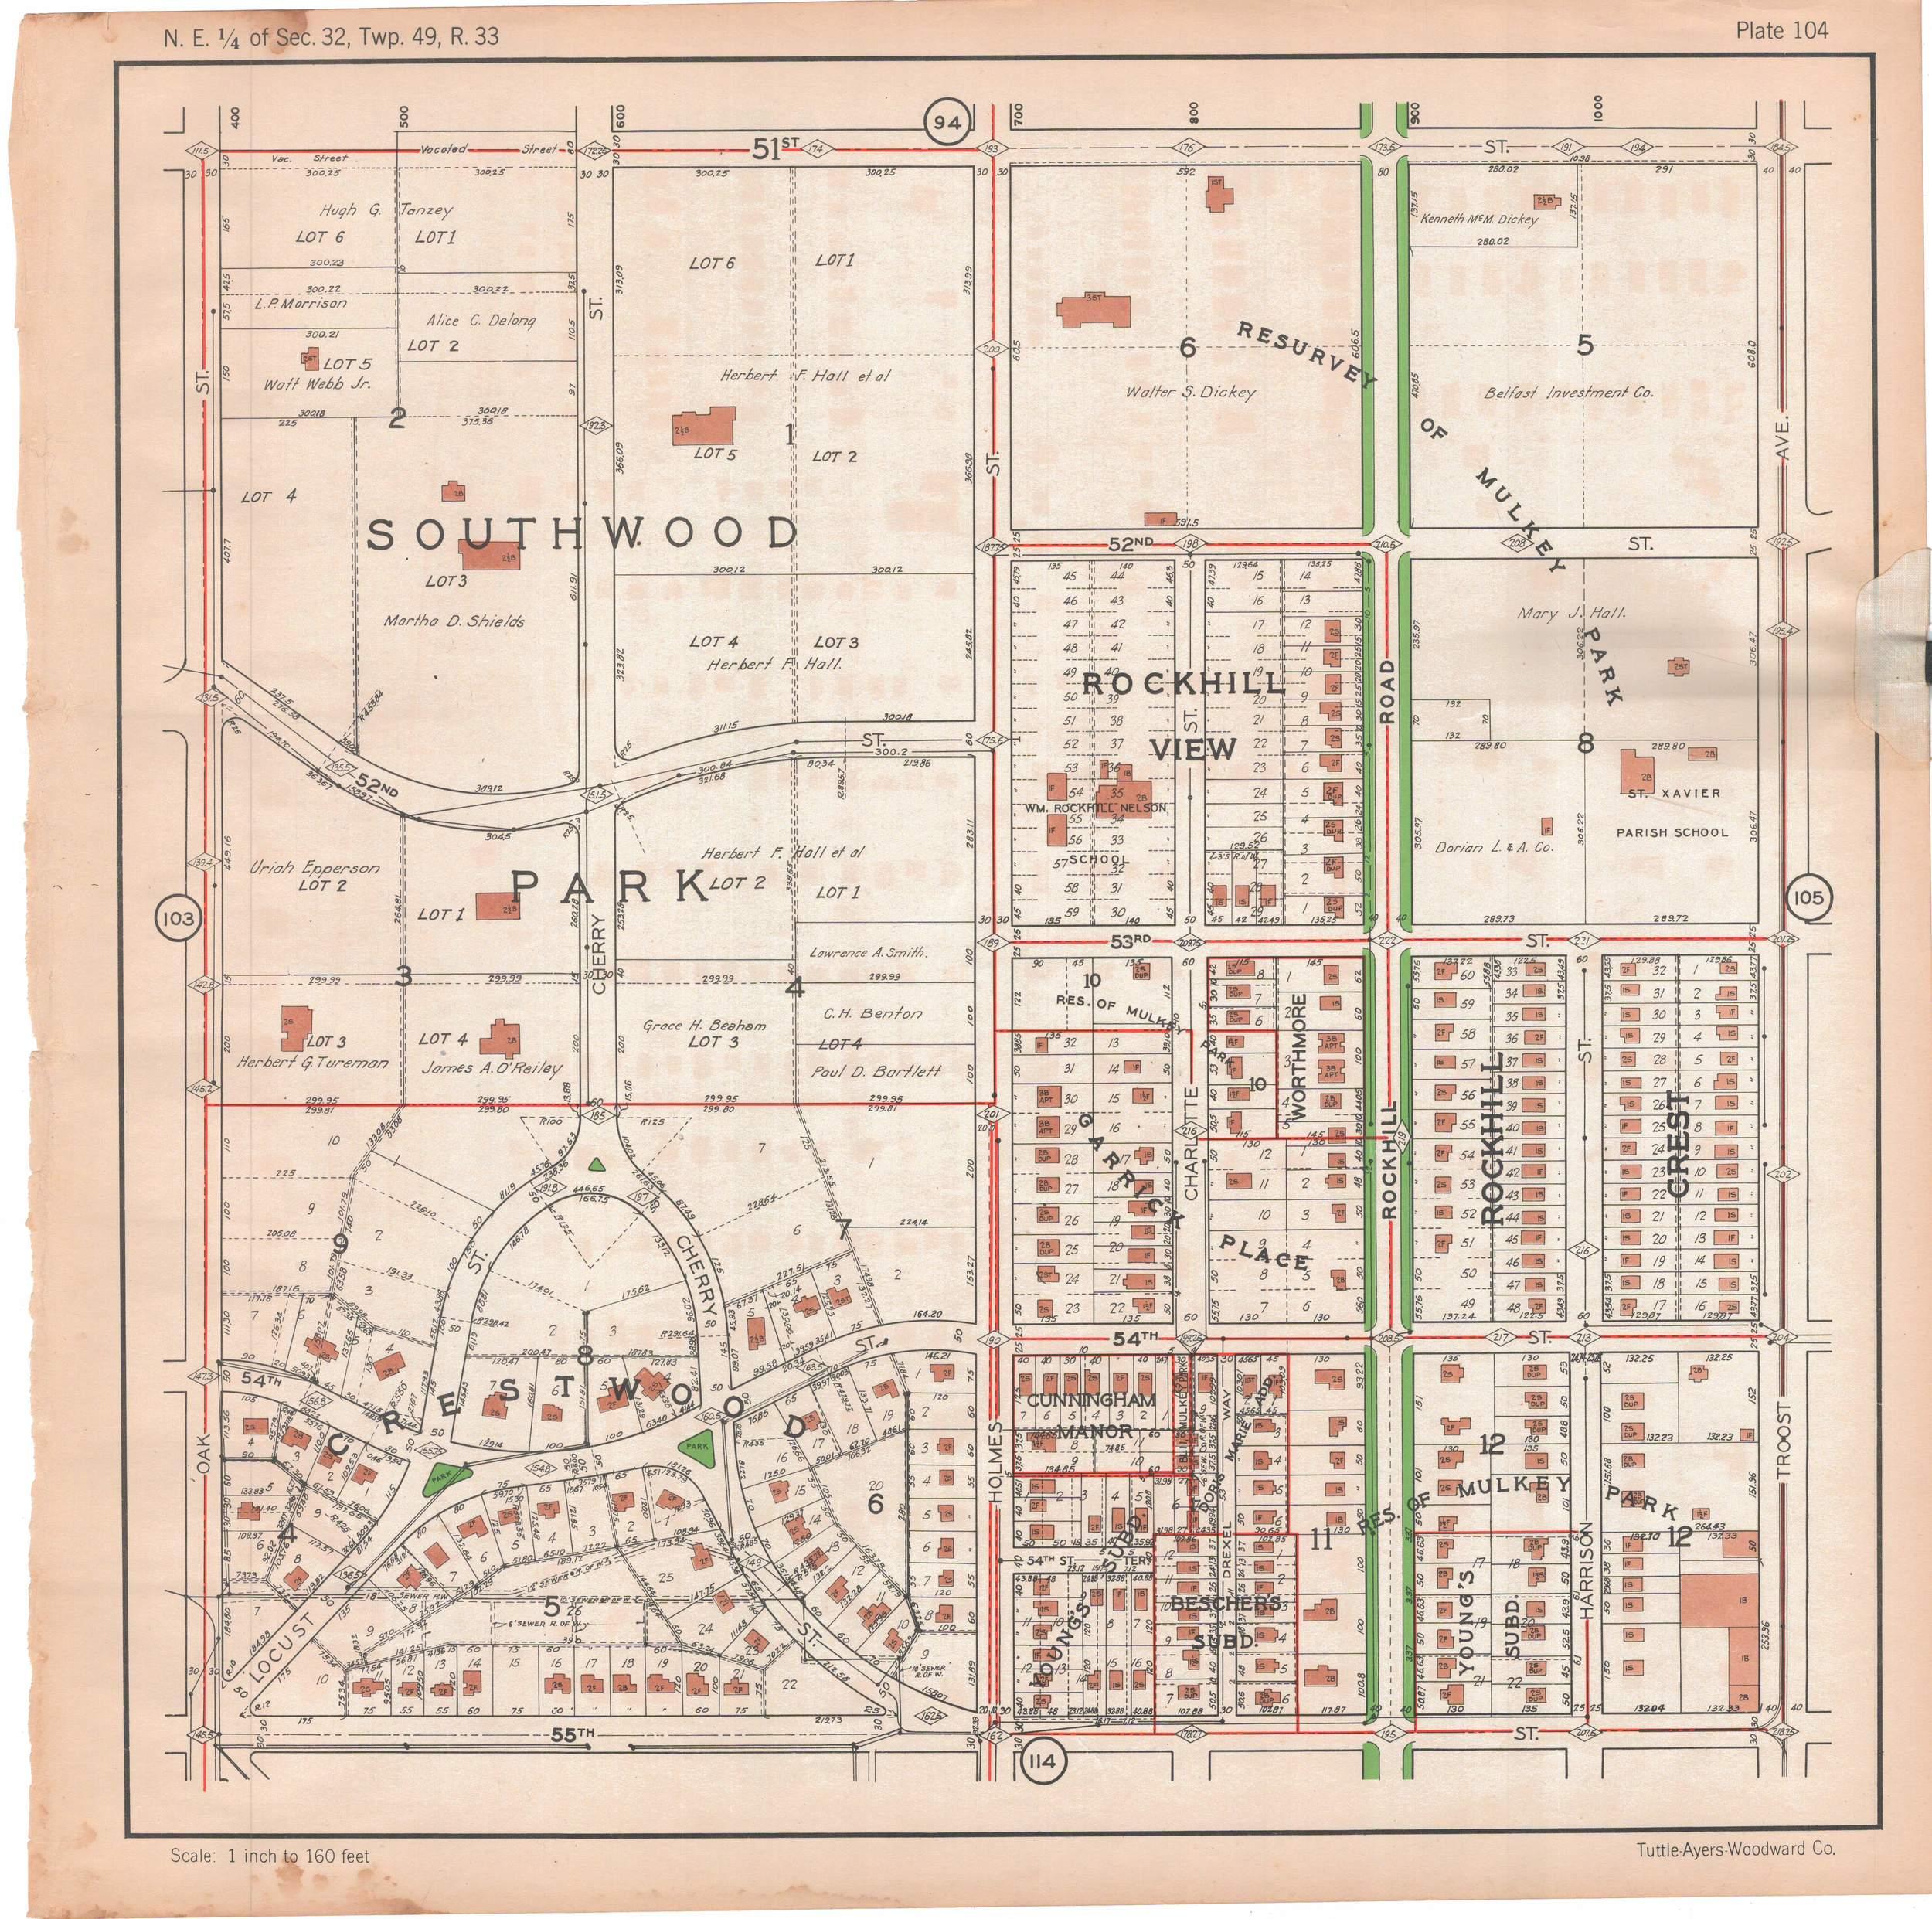 1925 TUTTLE_AYERS_Plate 104.JPG